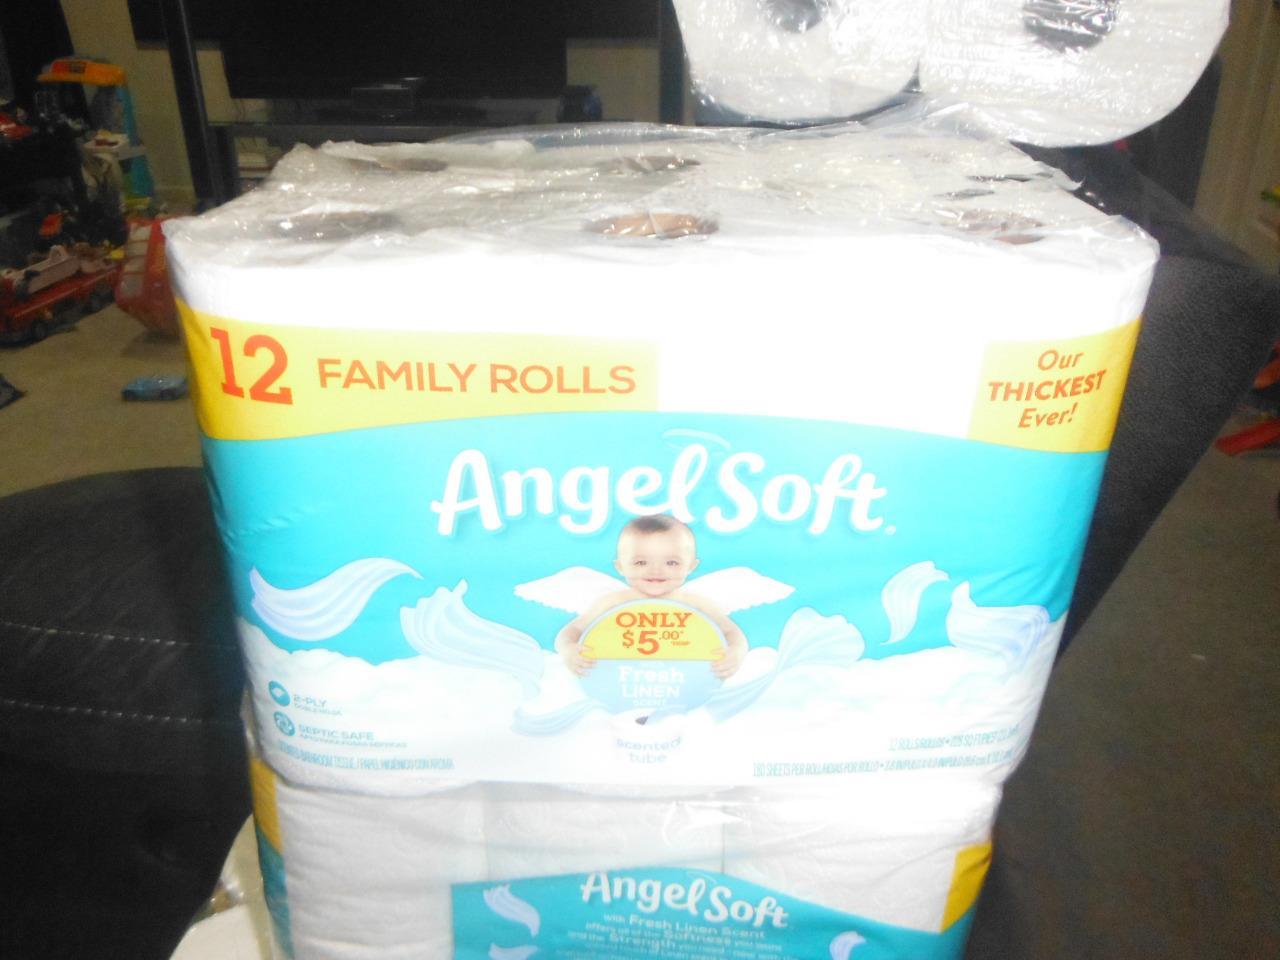 Angel Soft 12 Family Rolls Regular Ultra Strong Toilet Paper